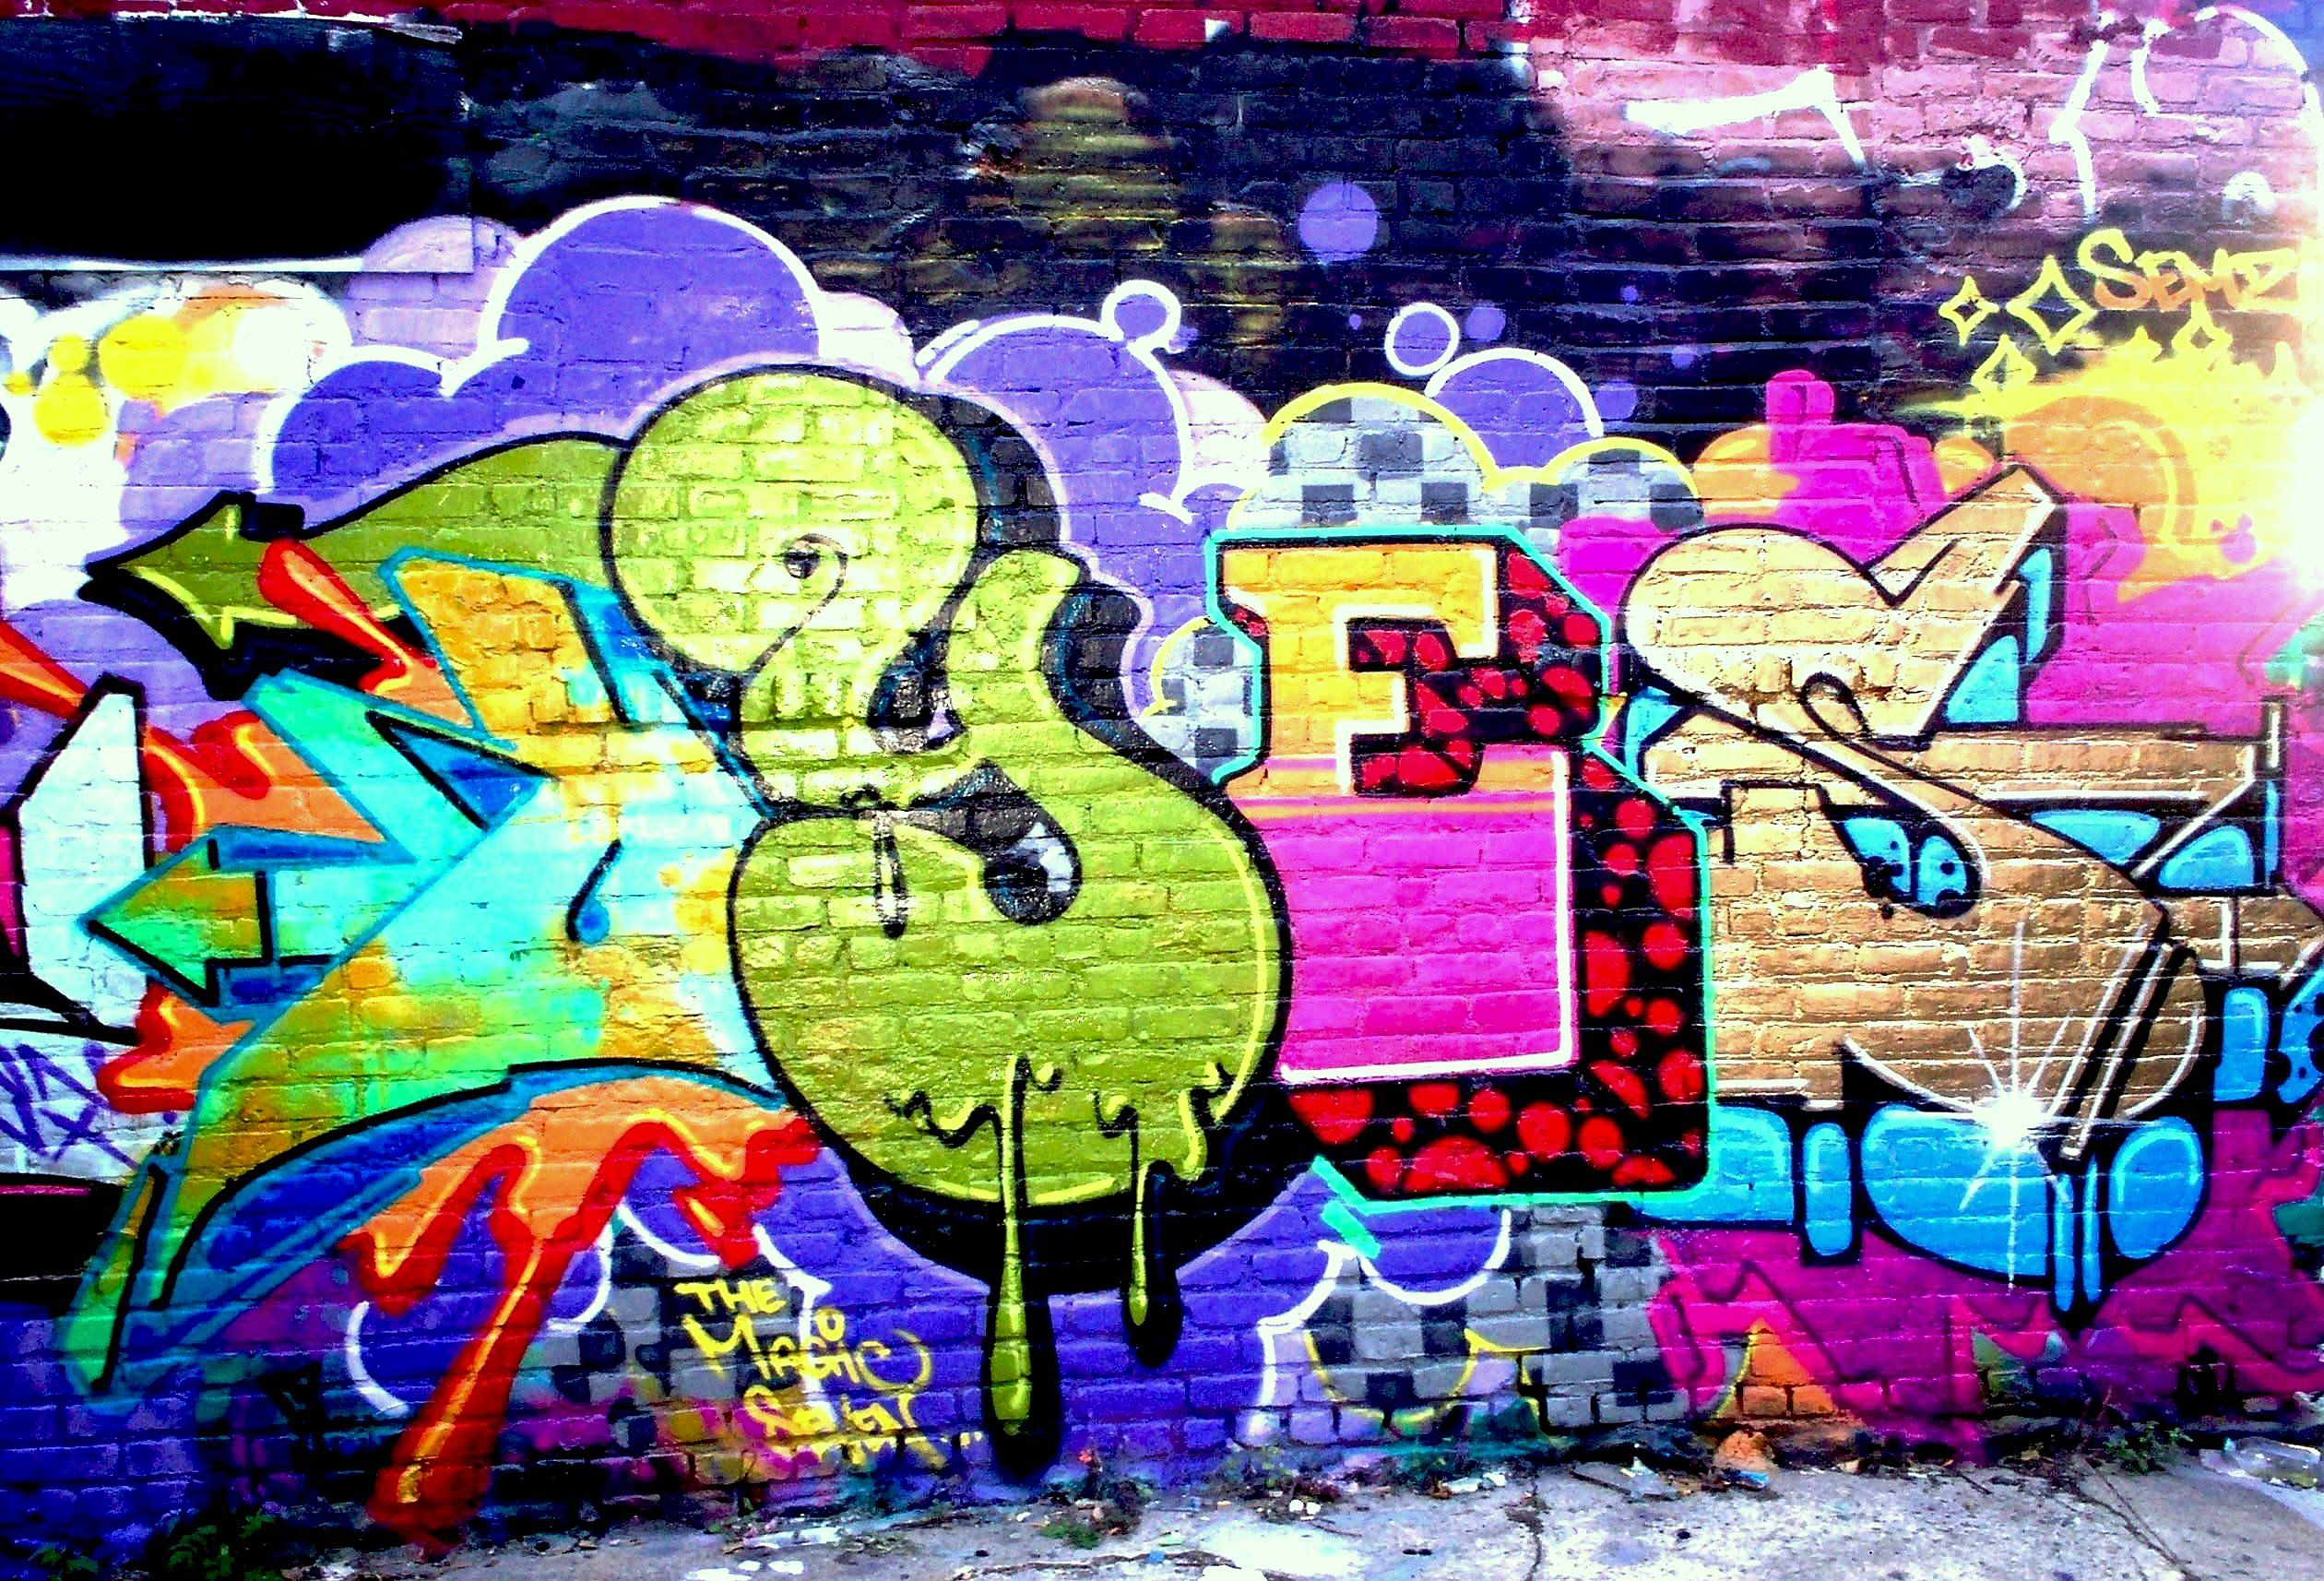 Graffiti wall pictures - Graffiti Wall Background Download Next Wallpaper Prev Wallpaper